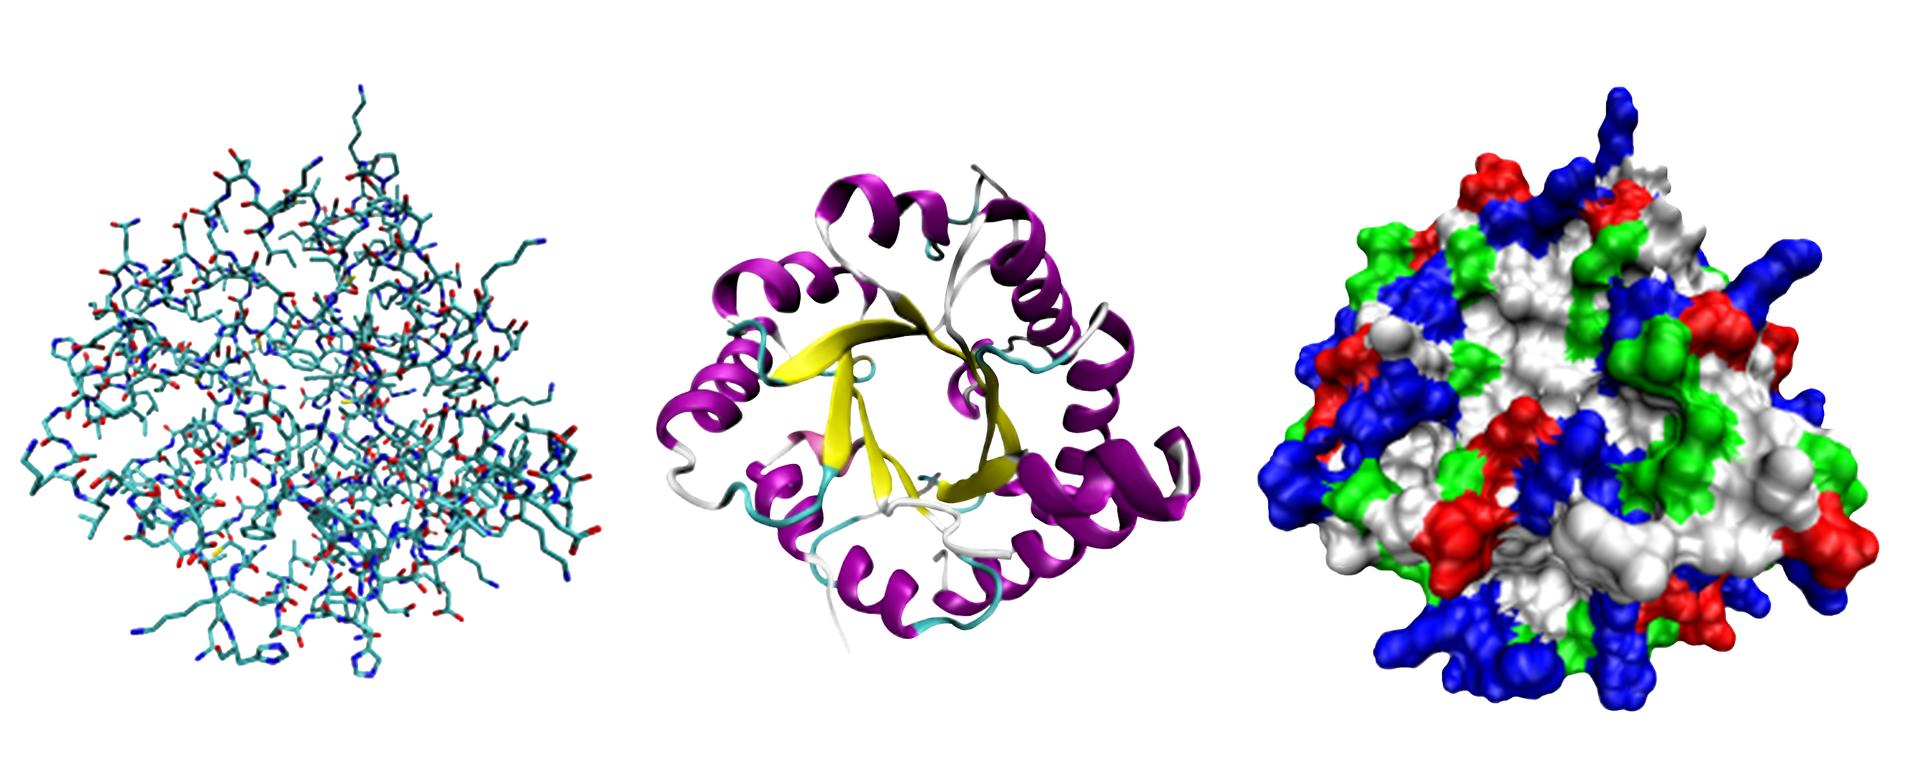 Modele różnych struktur białek